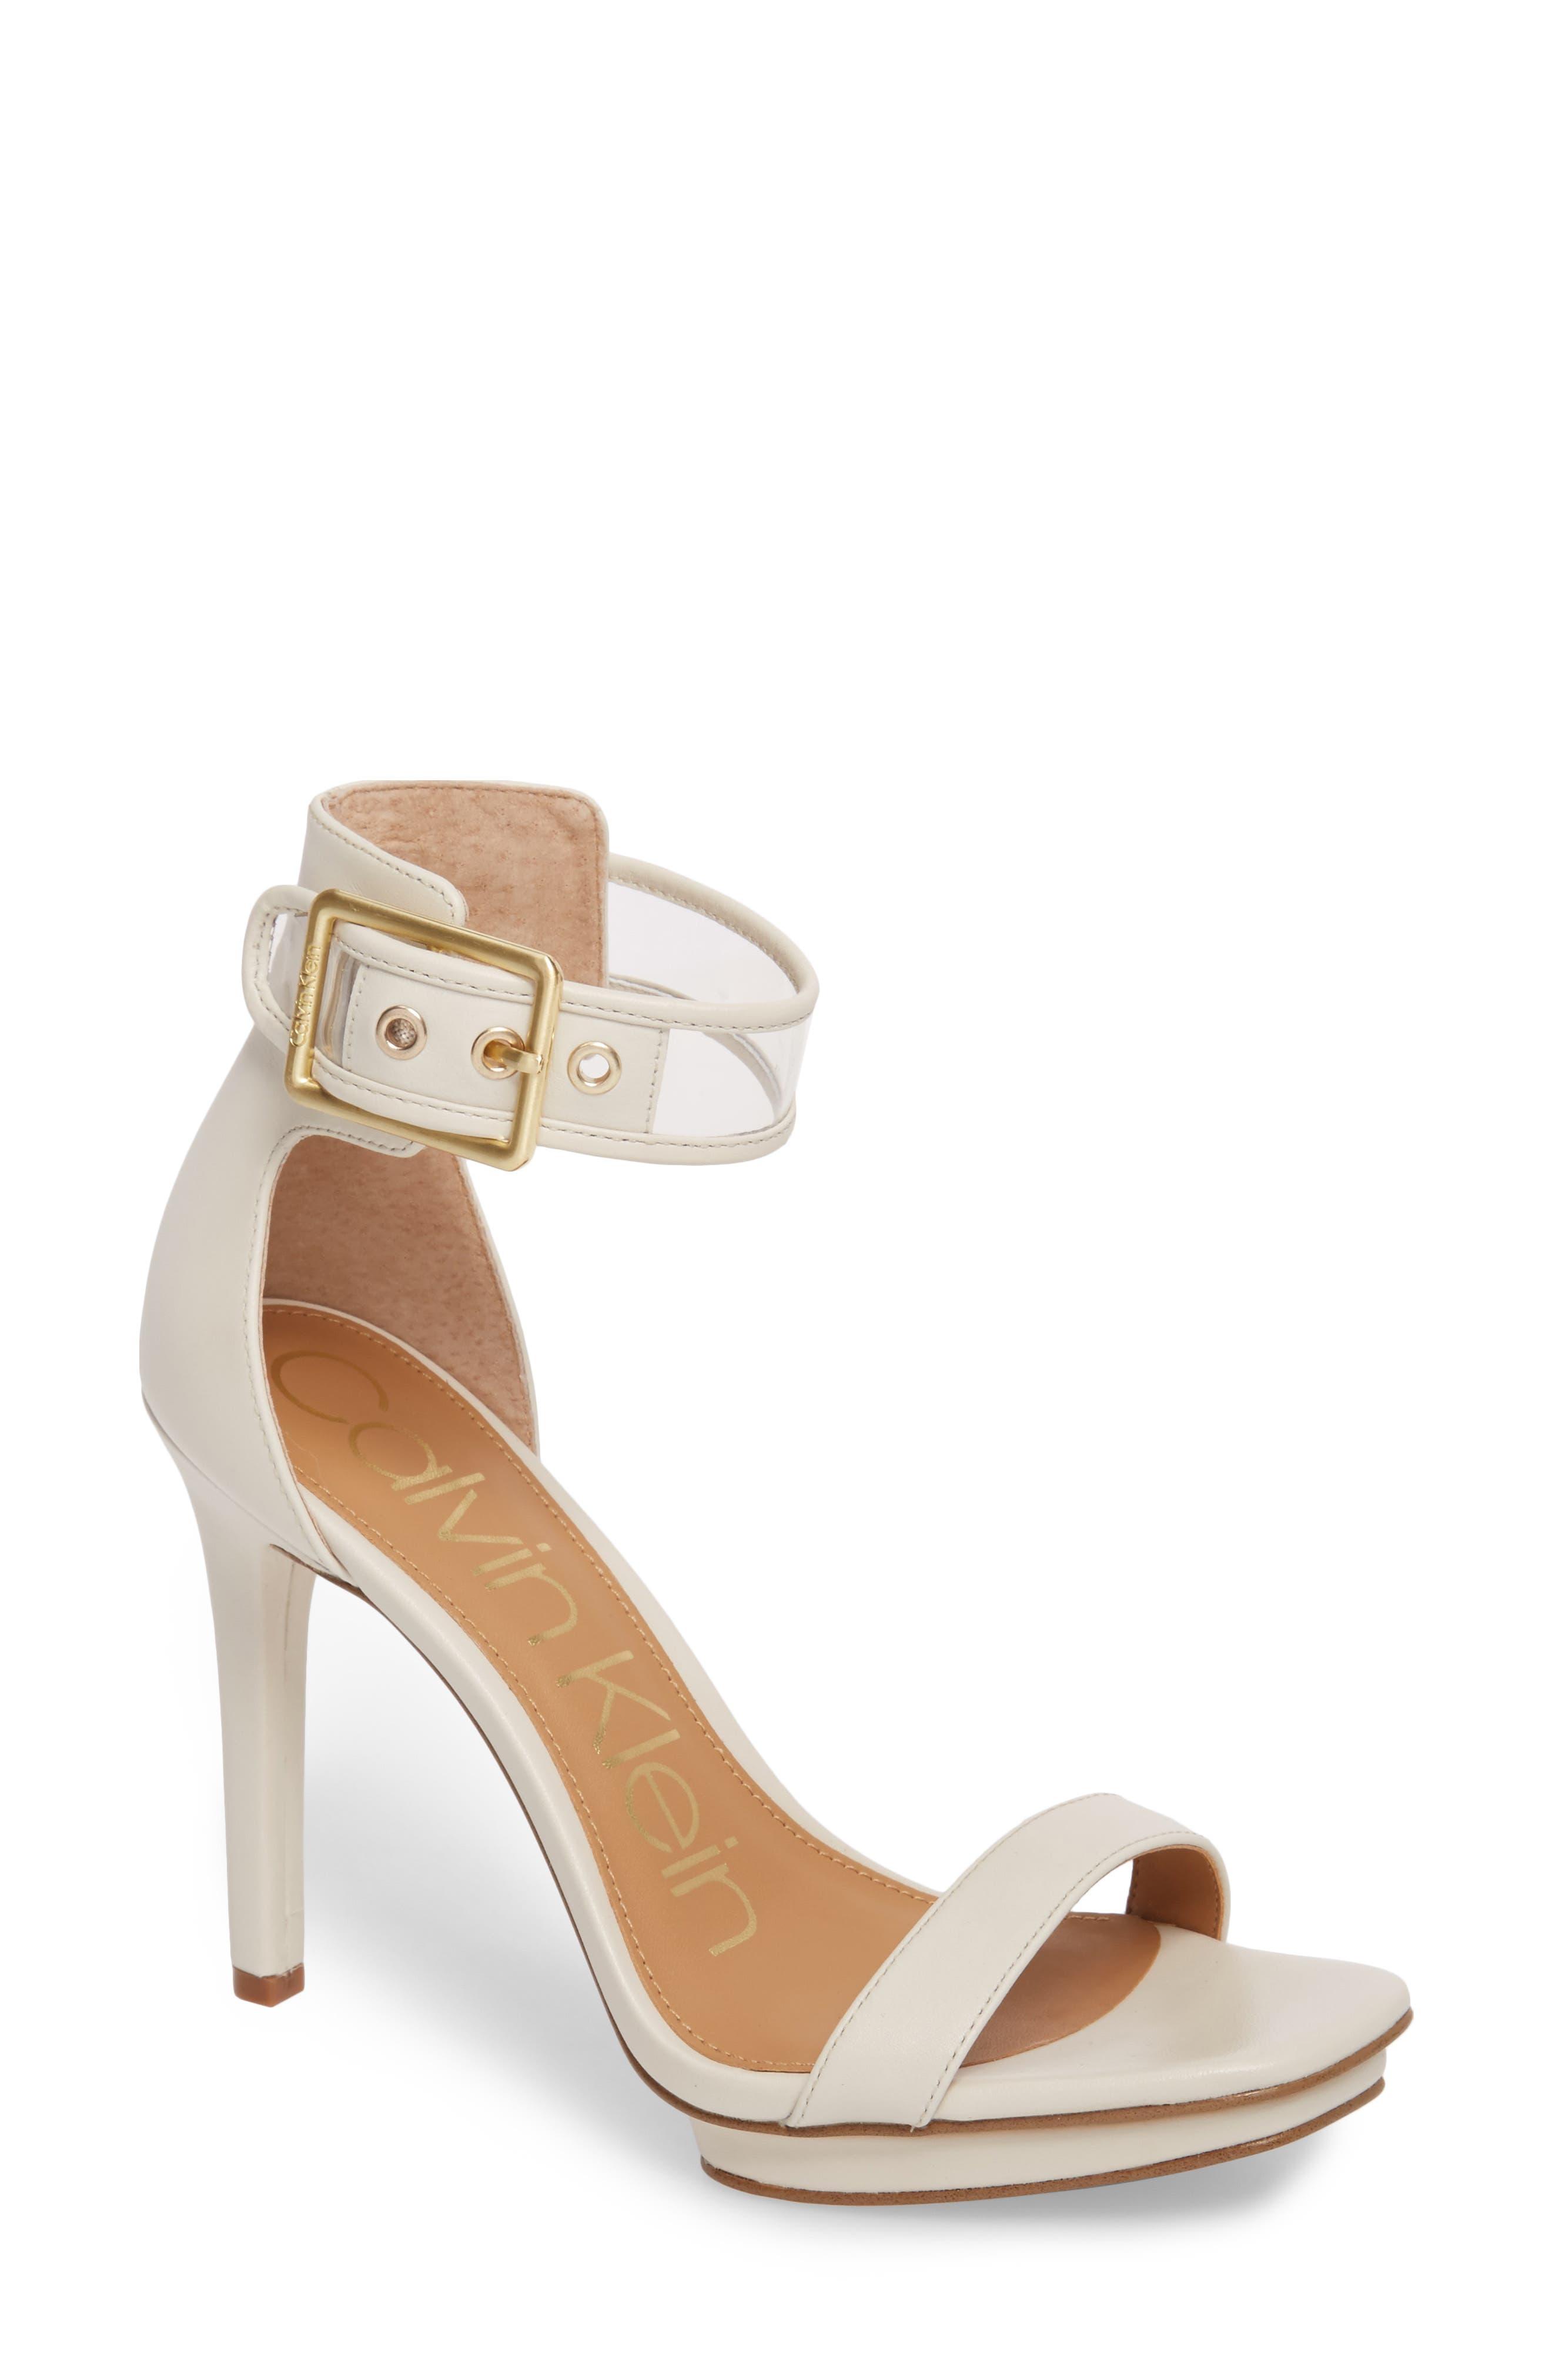 Vable Sandal,                         Main,                         color, Soft White Leather